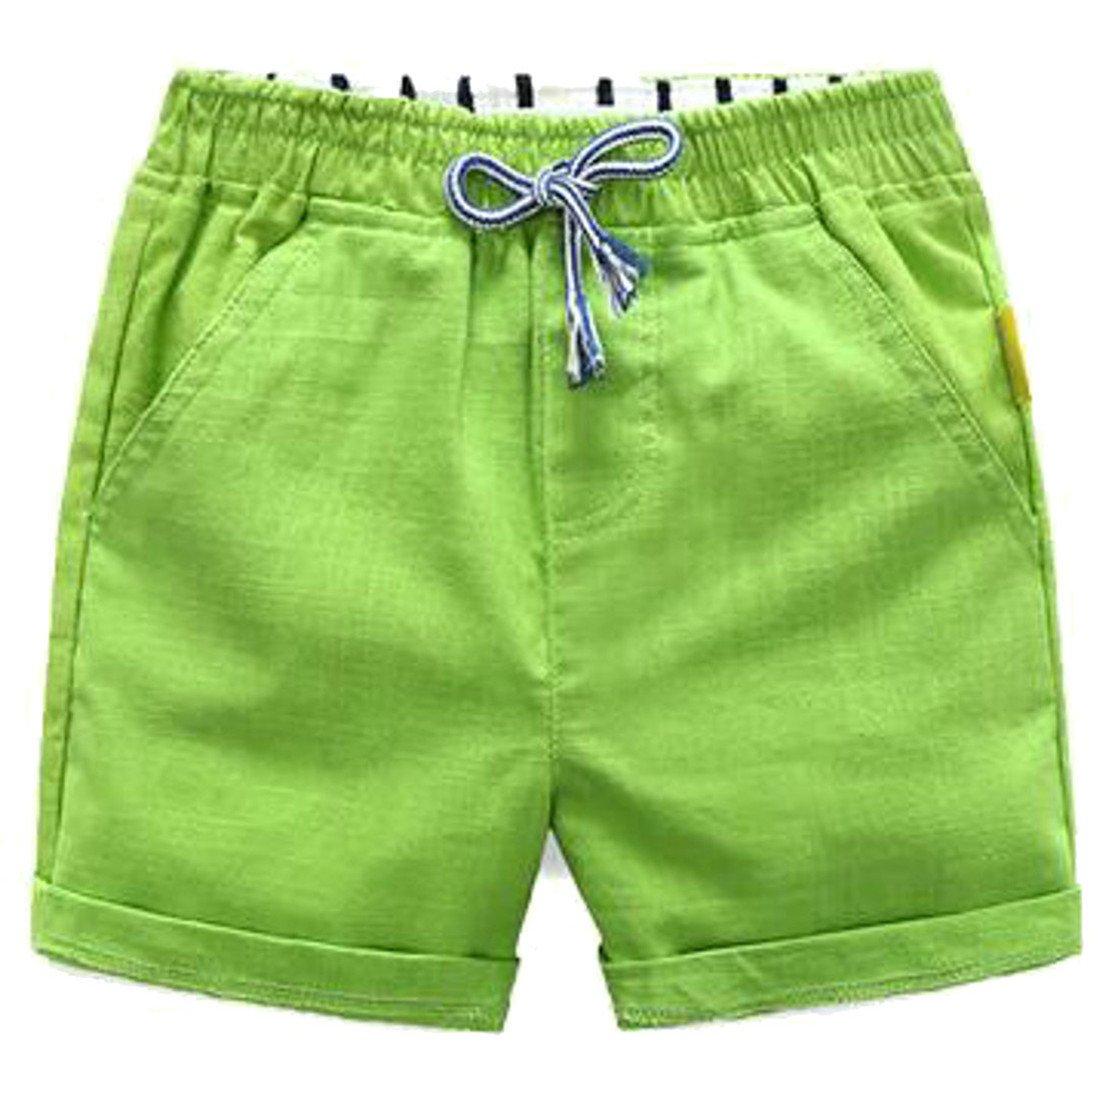 Papijam Girls Boys Elastic Waist Cotton Drawstring Cuffed Summer Shorts Green 10/12